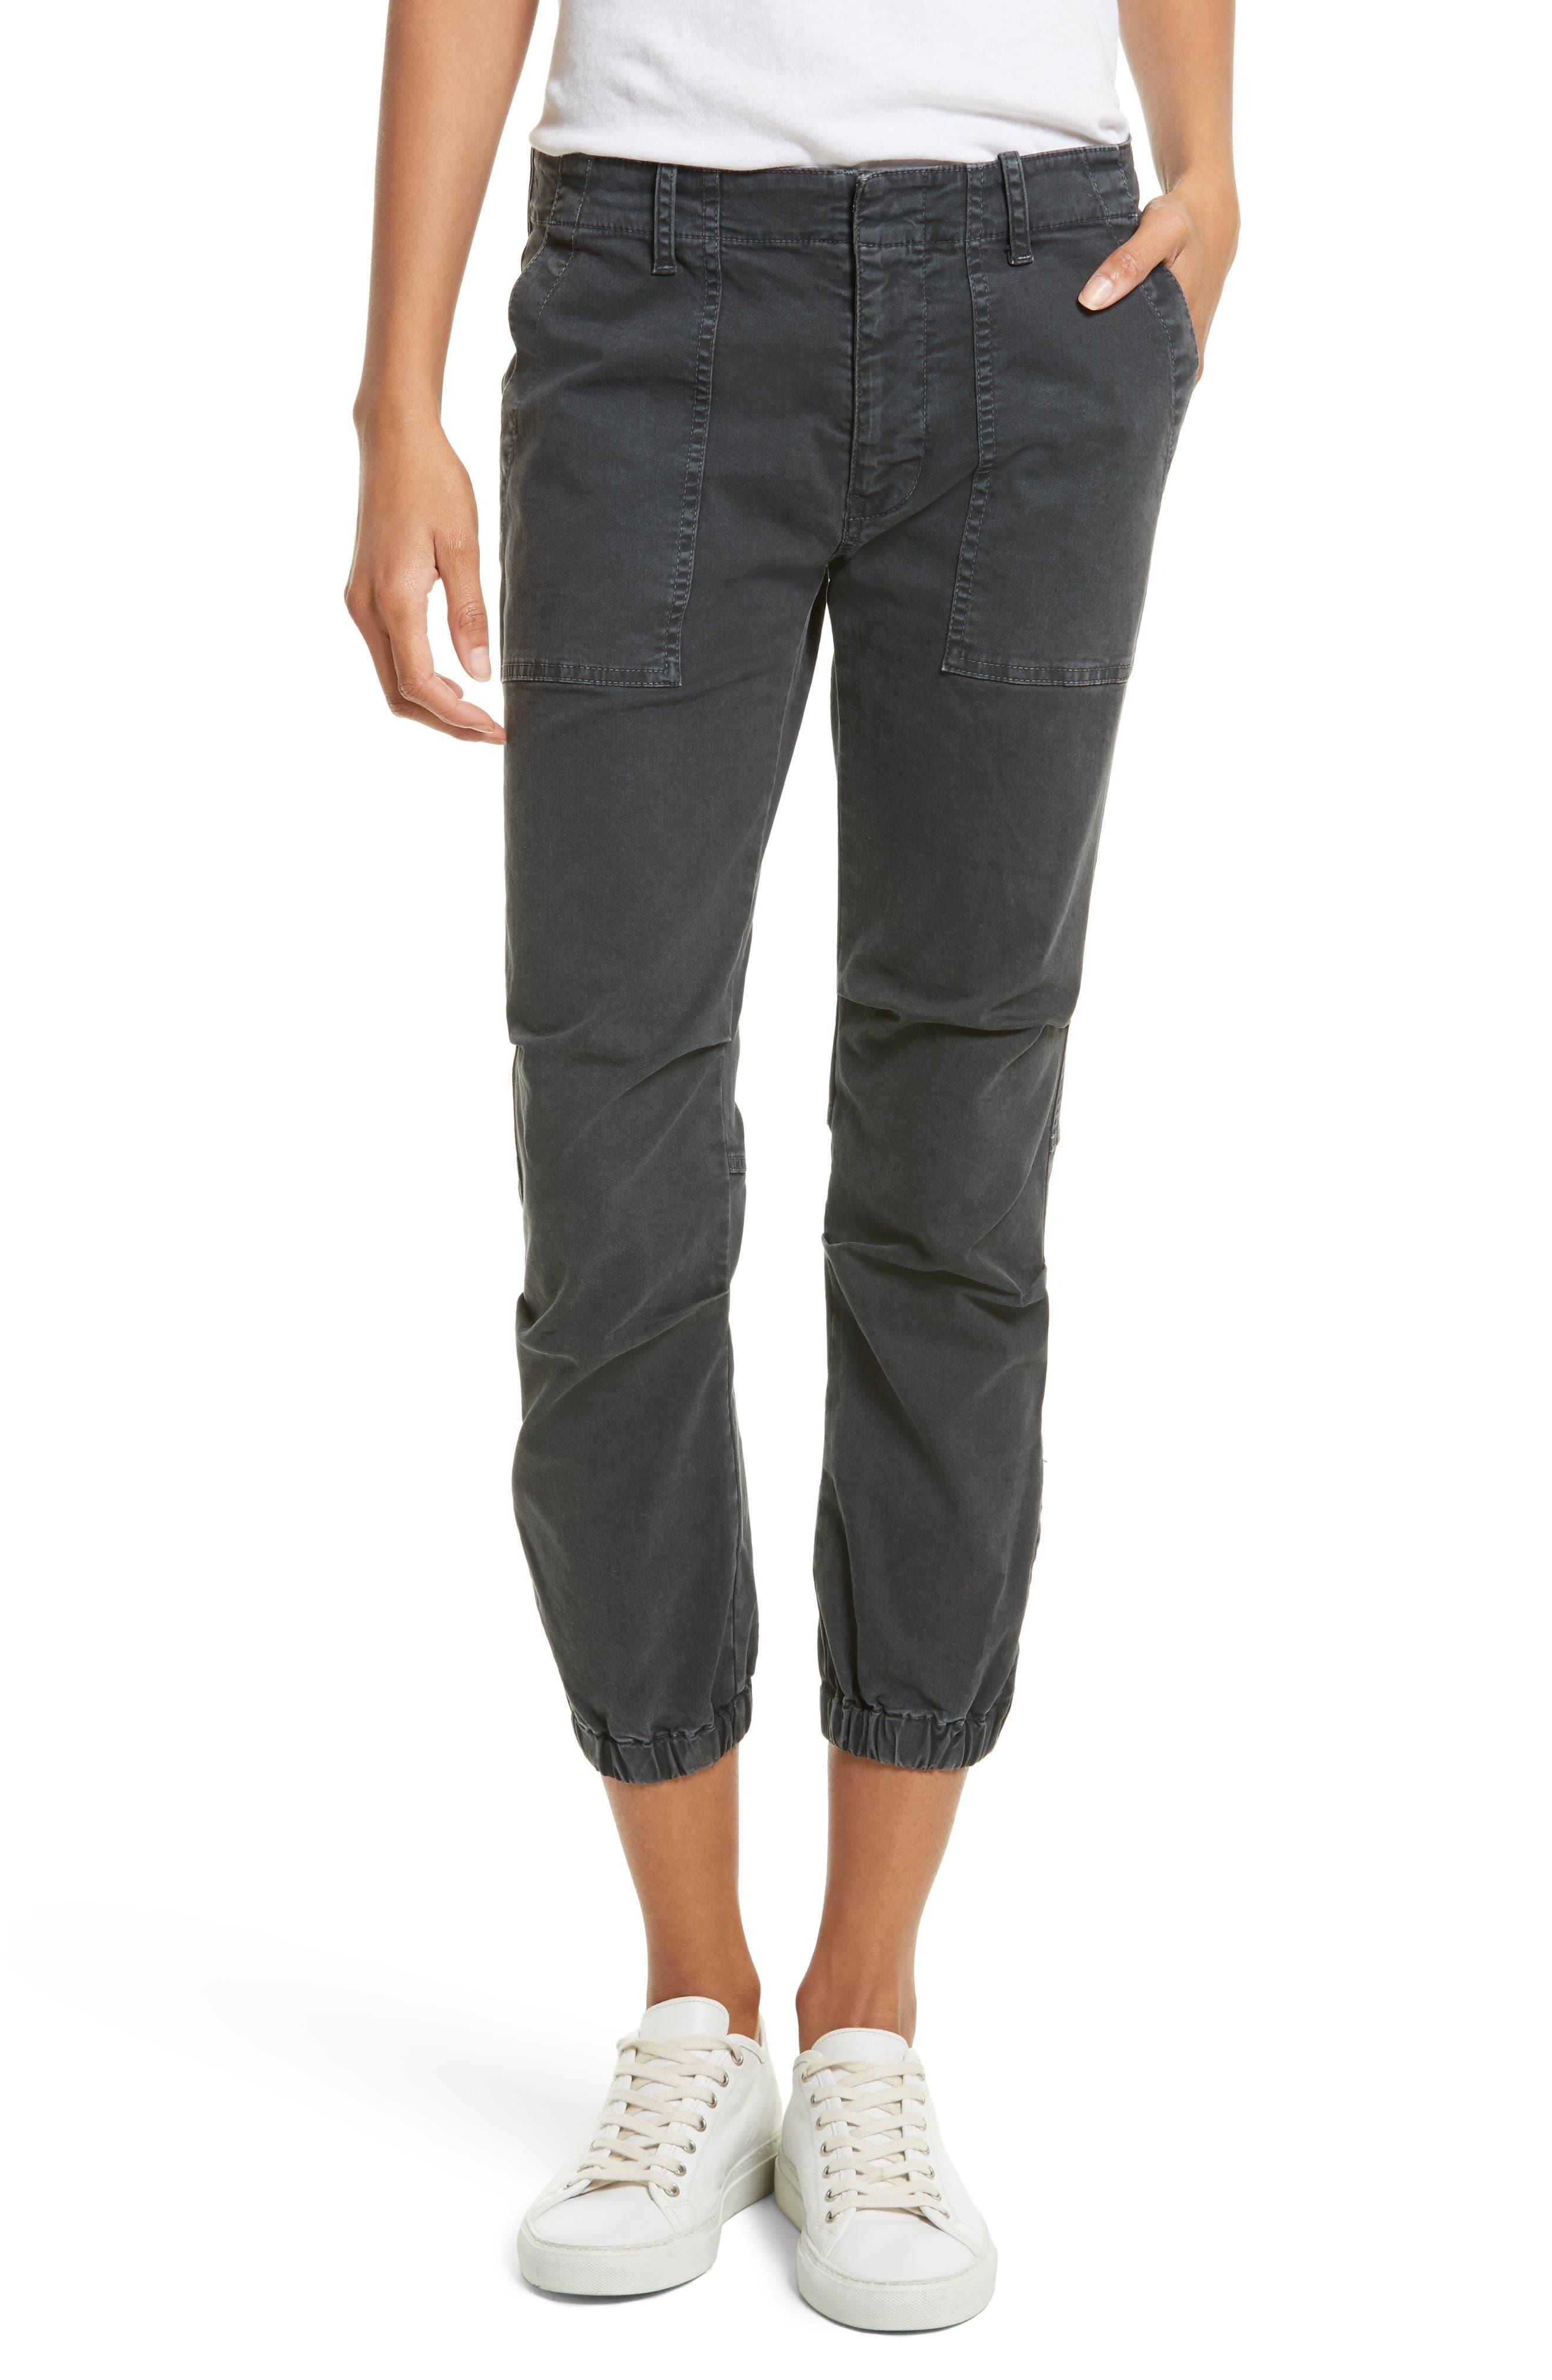 NILI LOTAN Stretch Cotton Twill Crop Military Pants, Main, color, CARBON